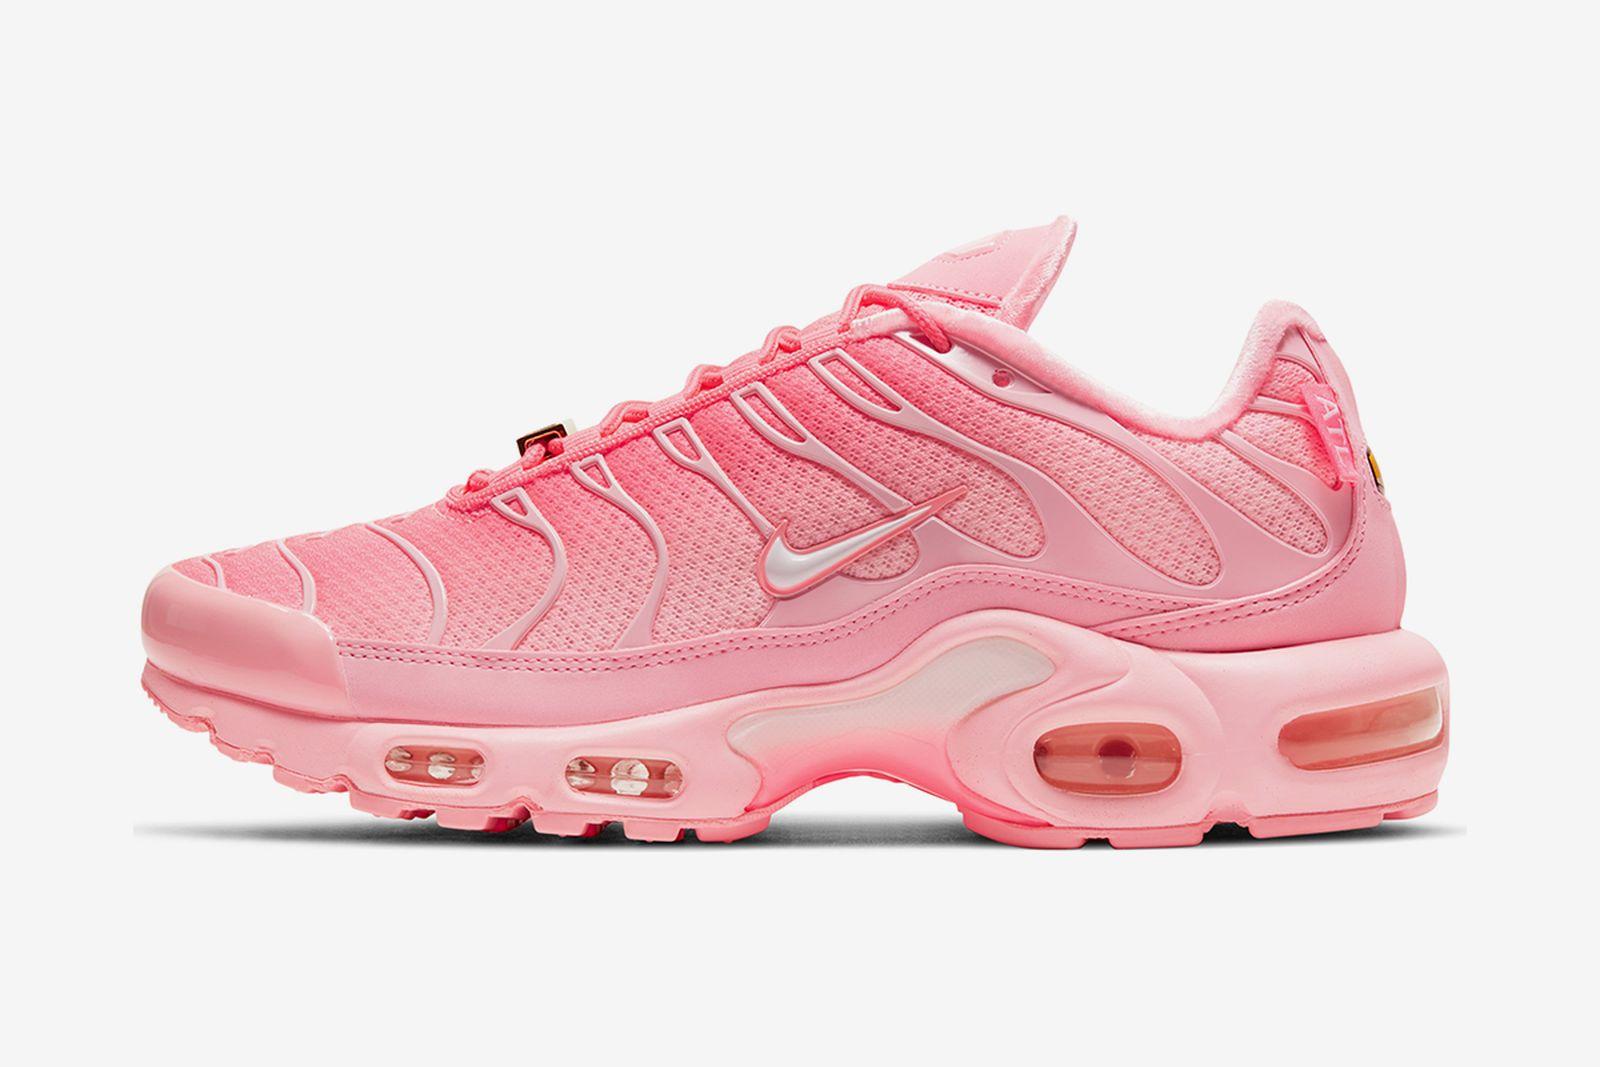 pharrell-adidas-hu-nmd-pink-release-info-4-06